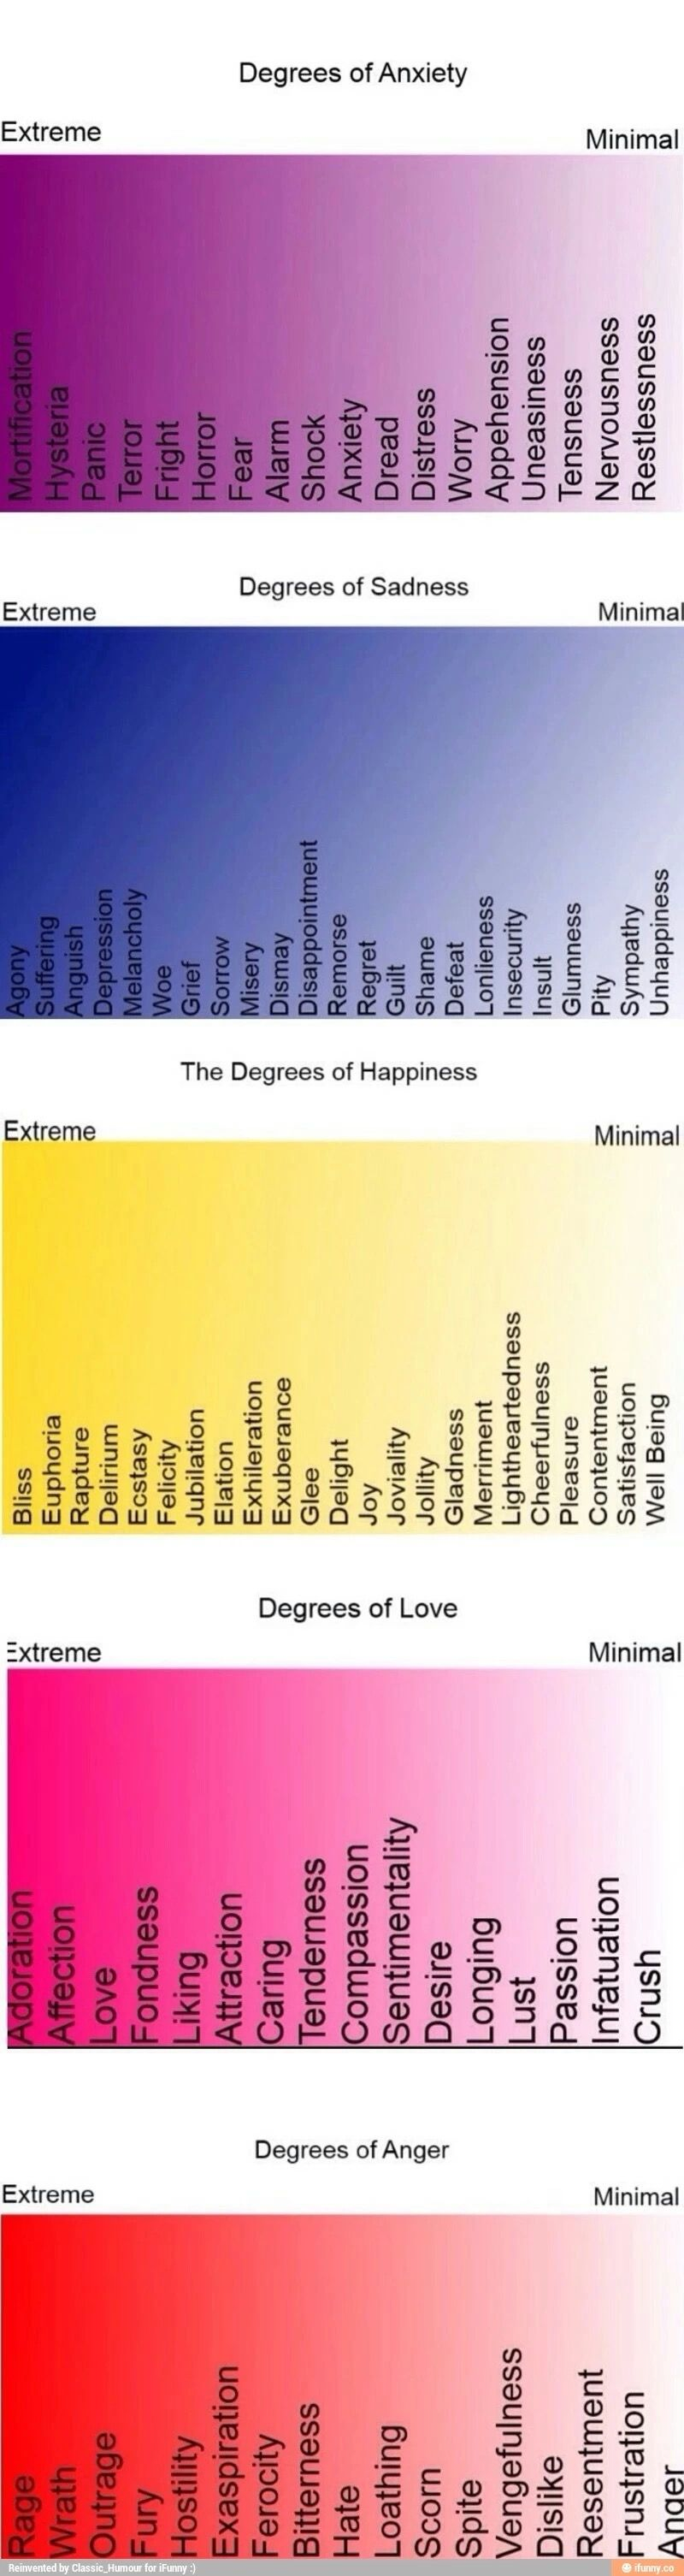 Philosophy of Language-Semantics/Reorientation of Platonic Divided Line